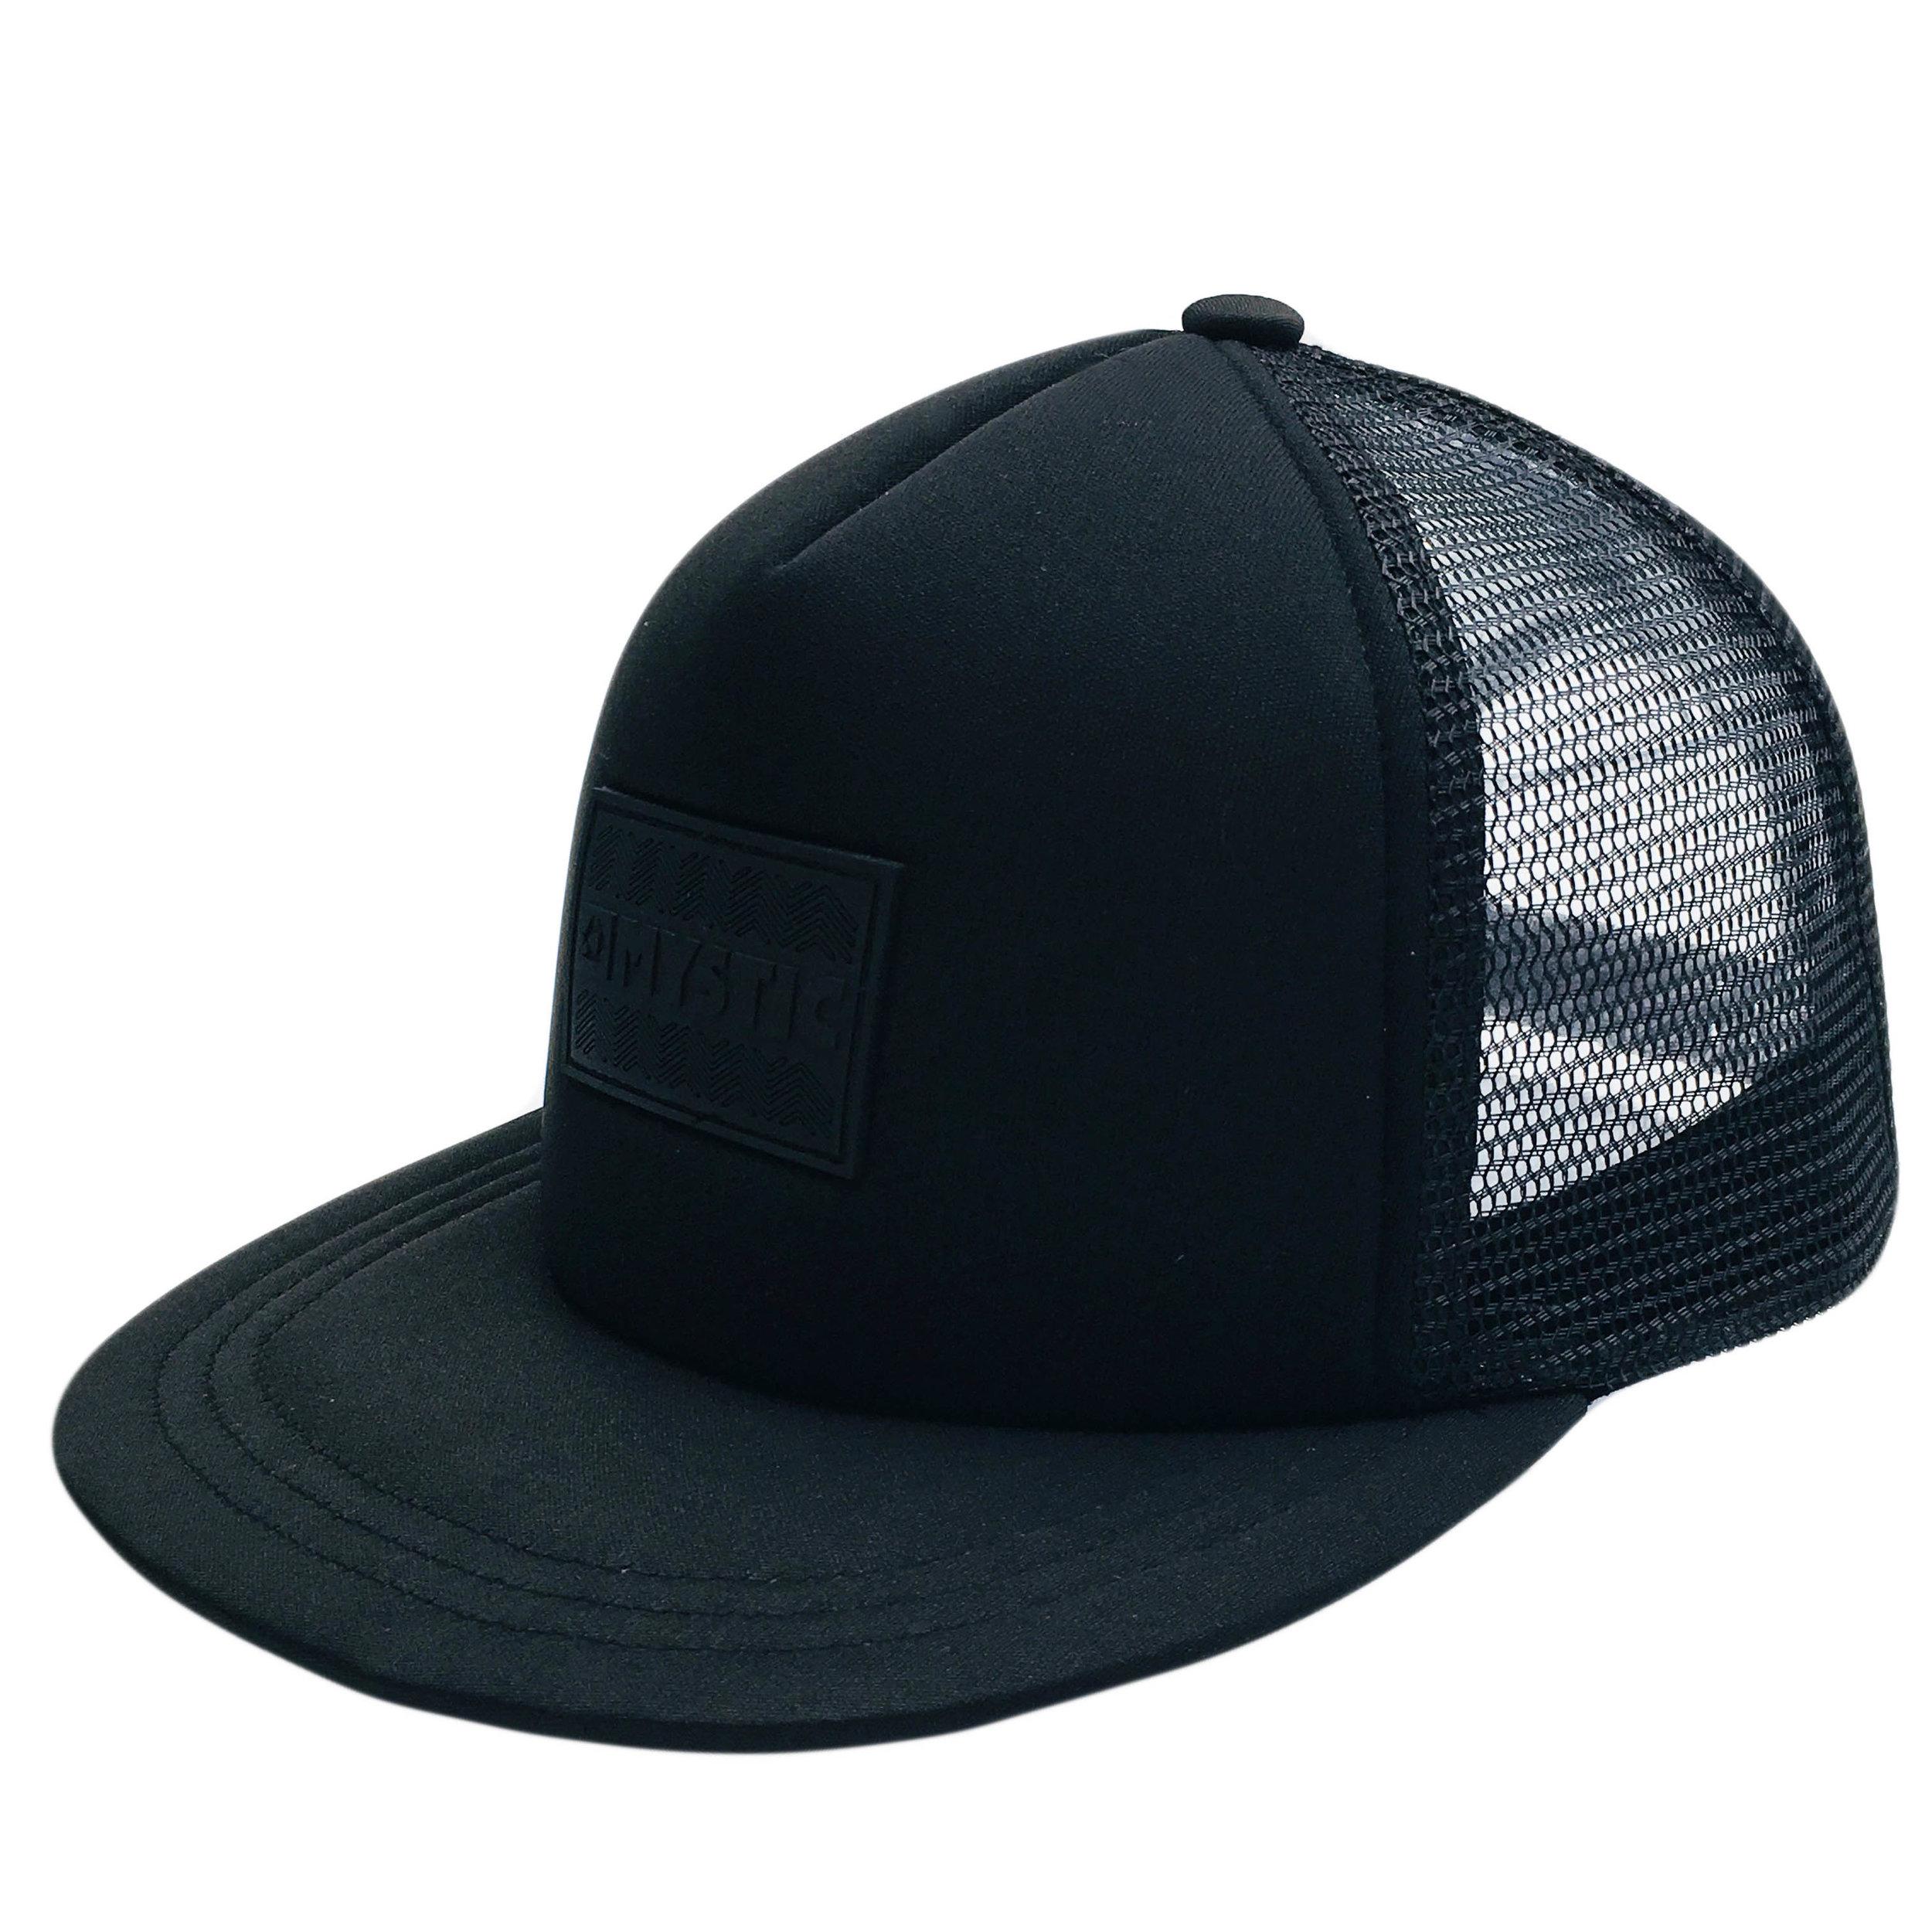 Custom Plastic Patch 5 Panel Trucker Hat